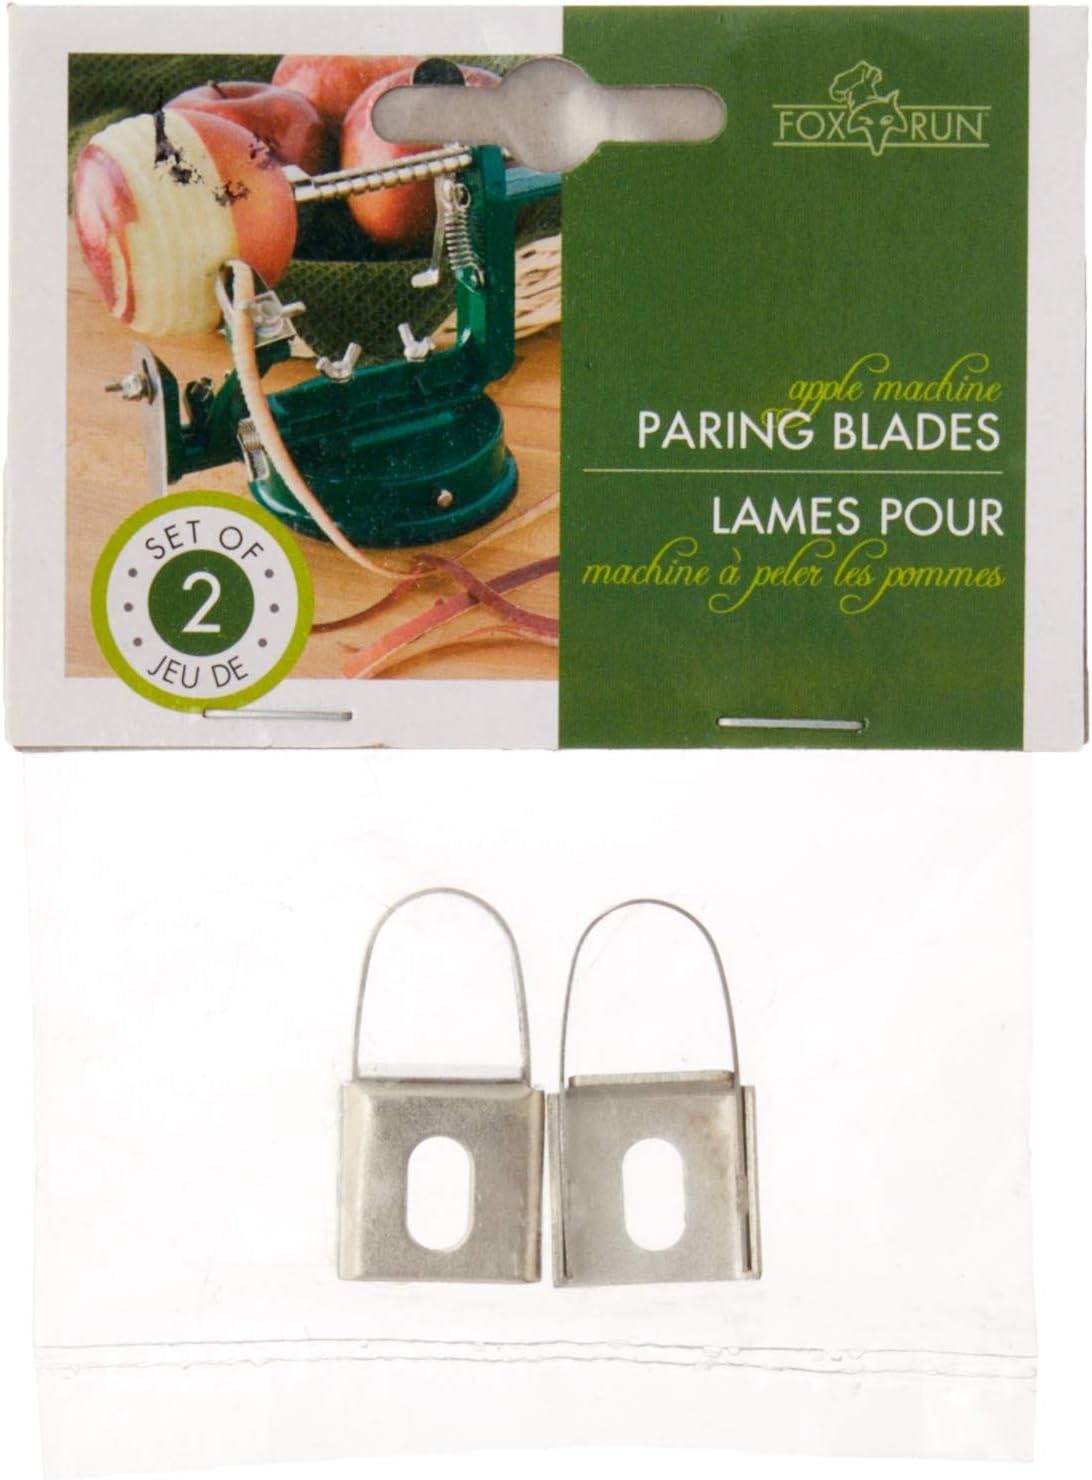 Fox Run 5779 Apple Peeling Machine Replacement Blades, Stainless Steel, Set of 2